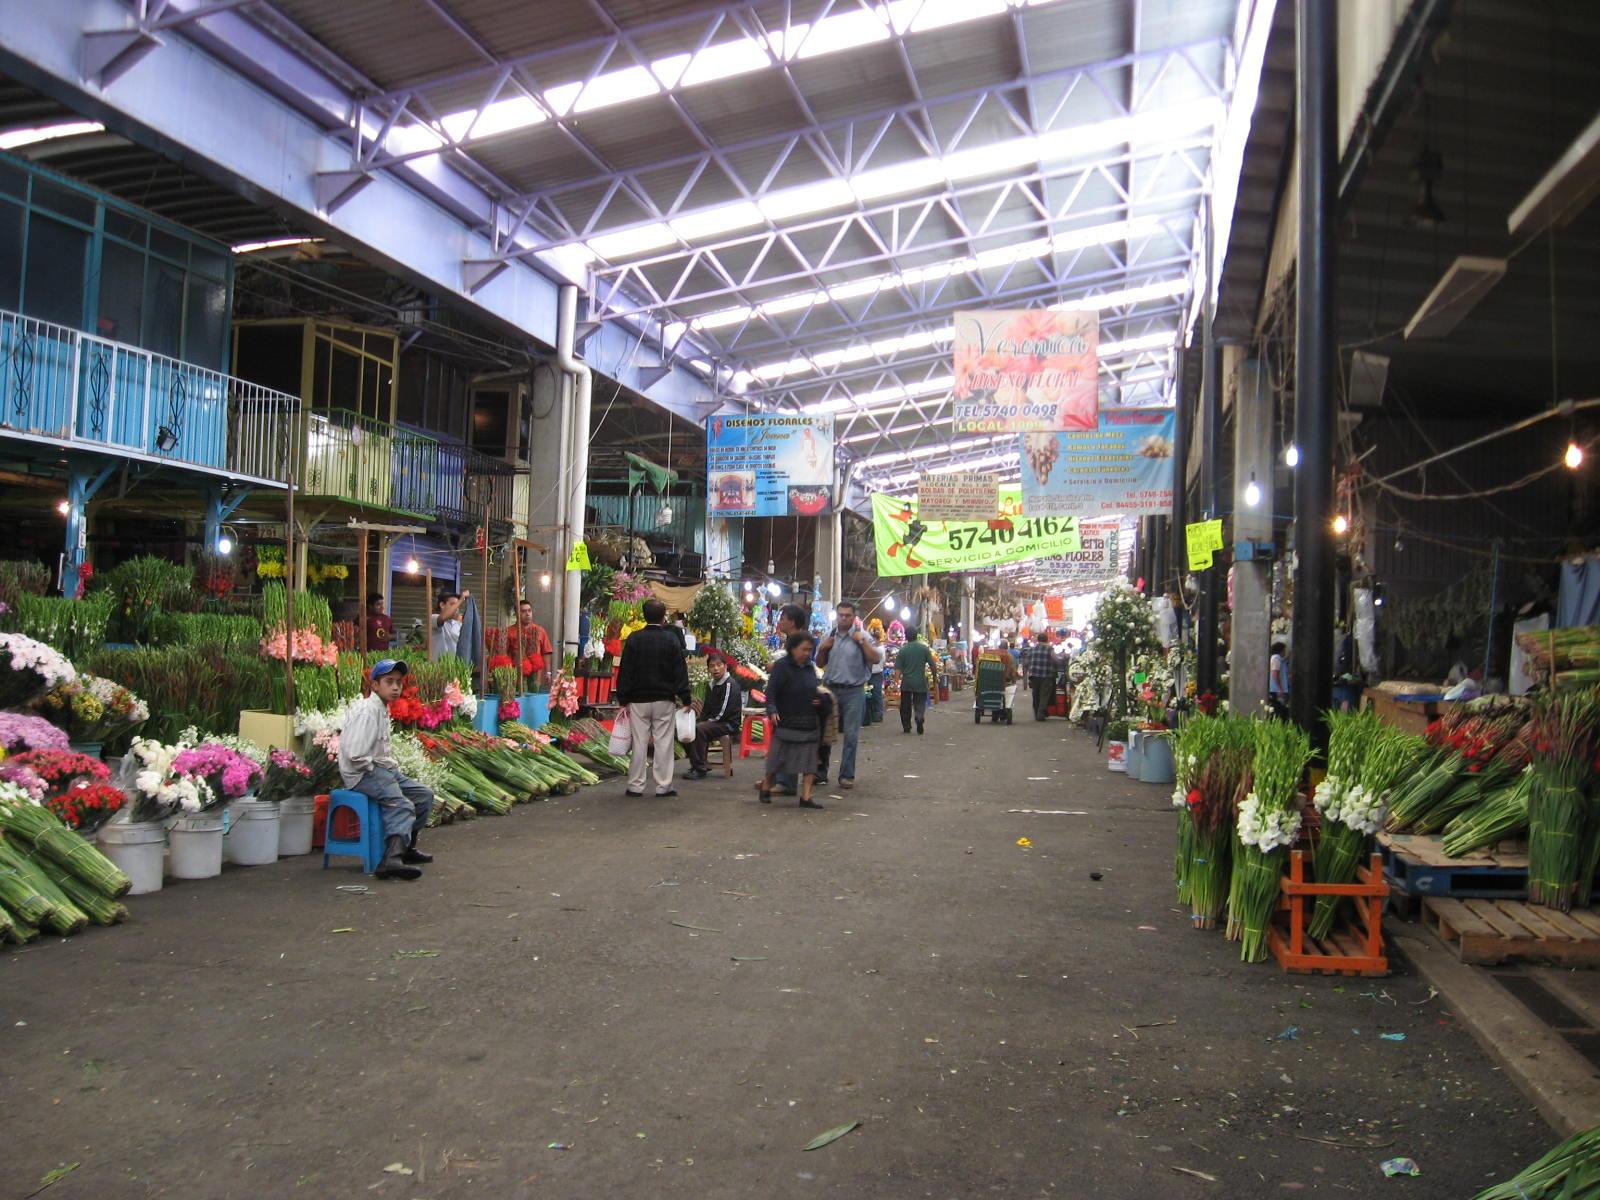 jamaica street market